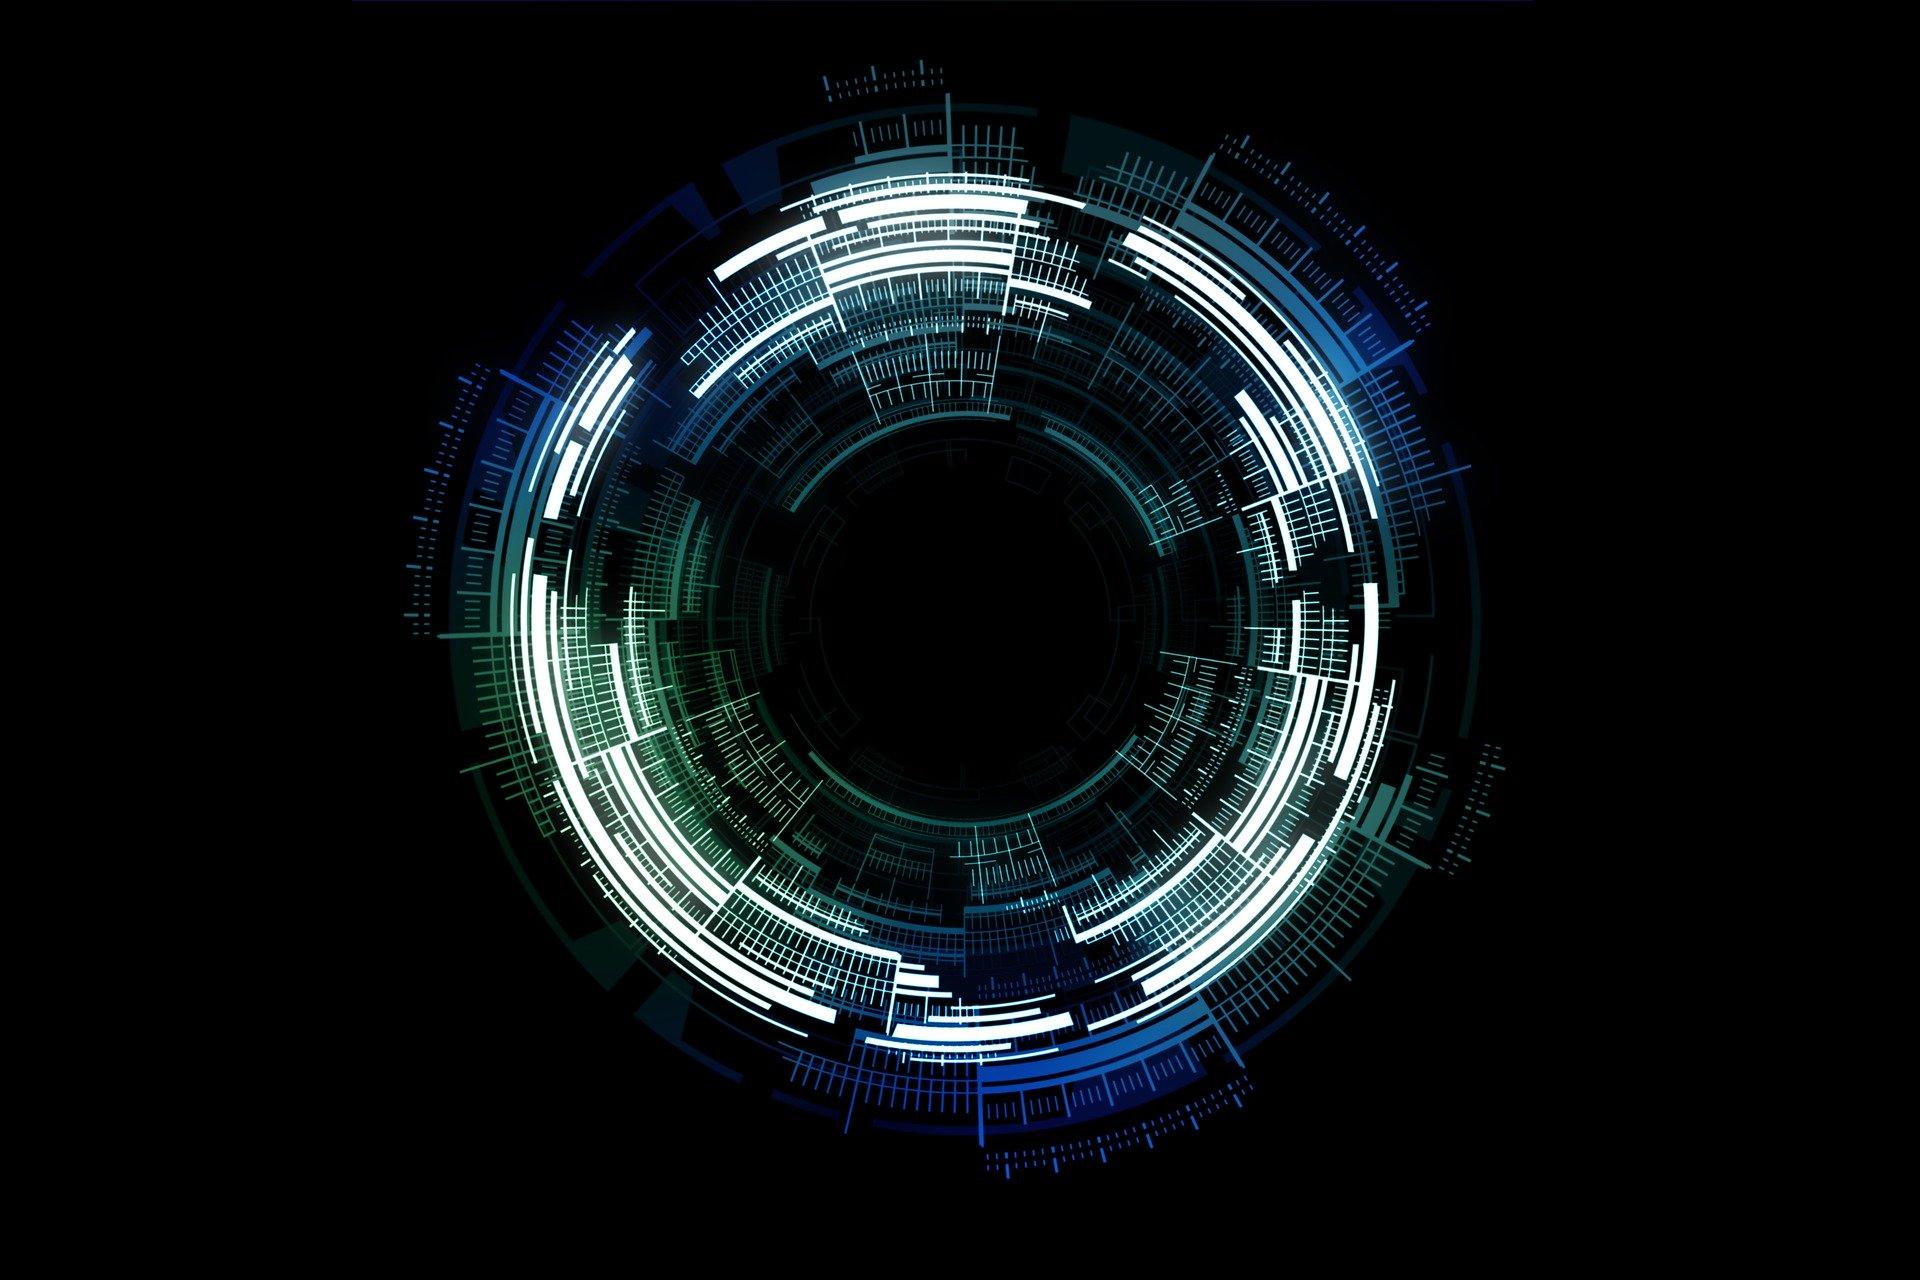 7 Sensor yang Sering Digunakan dalam Internet of Things